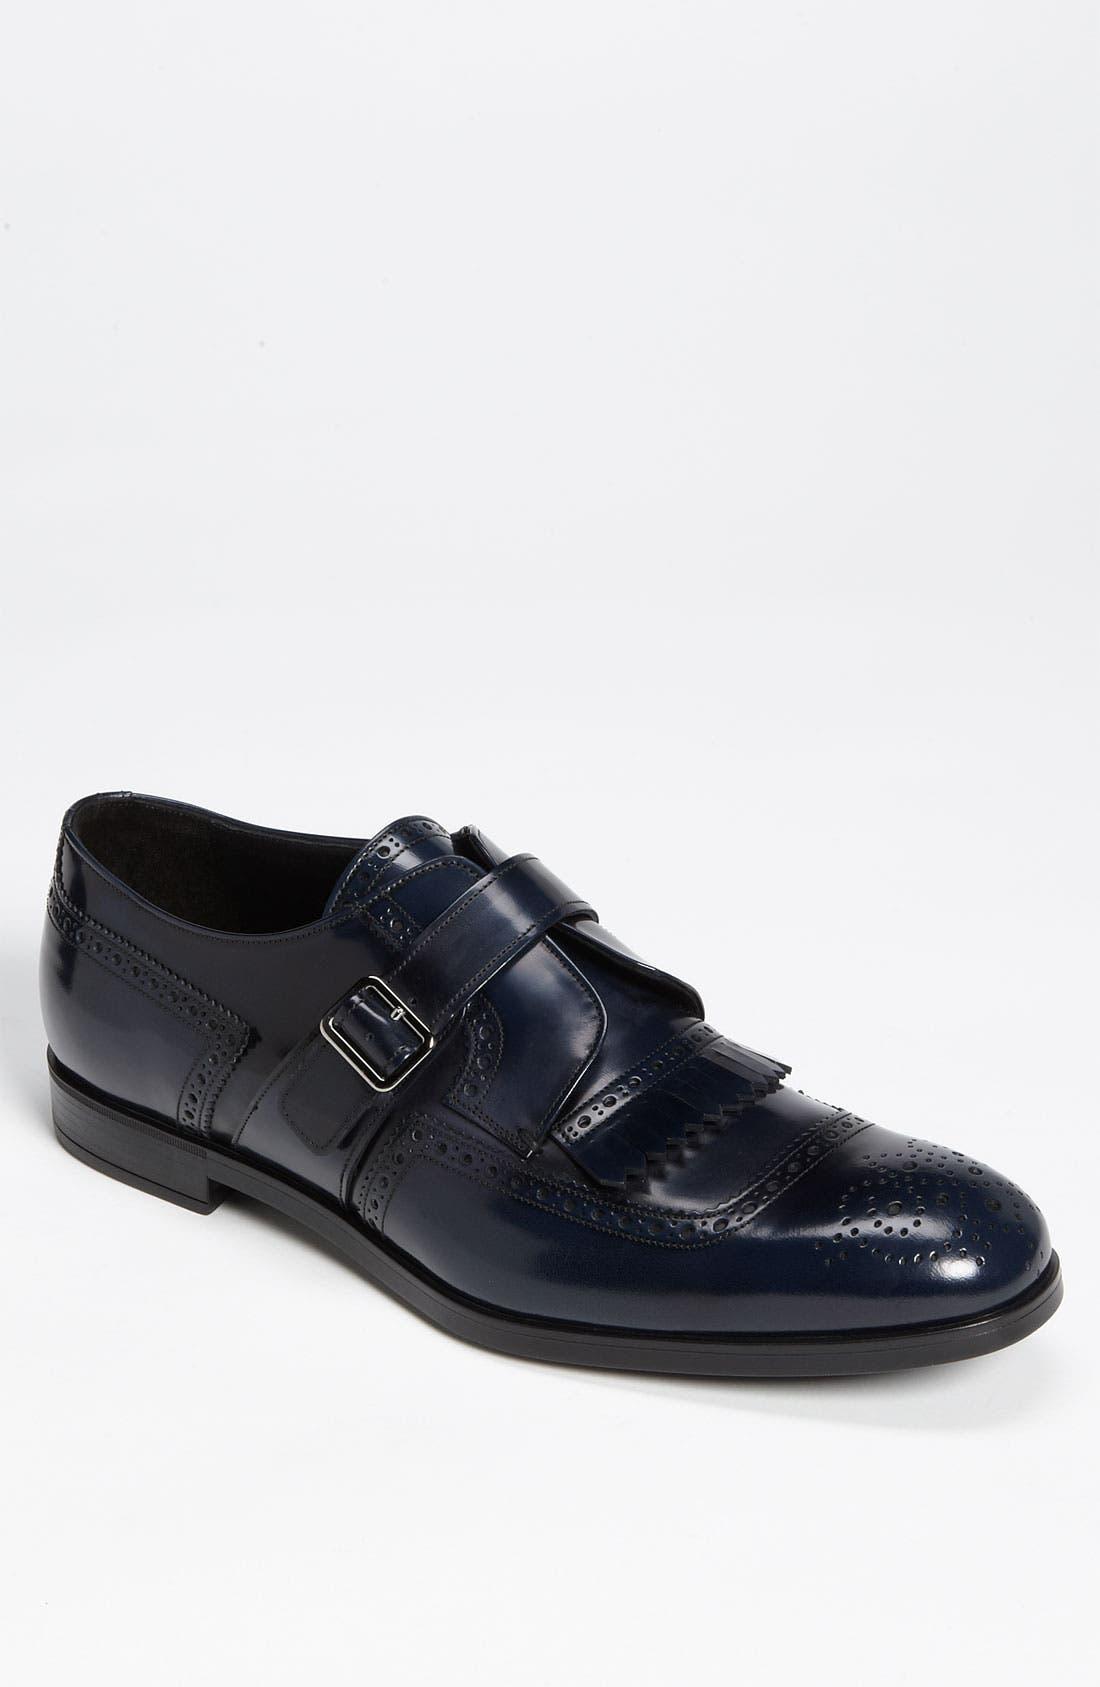 Main Image - Prada Brogue Kiltie Monk Strap Shoe